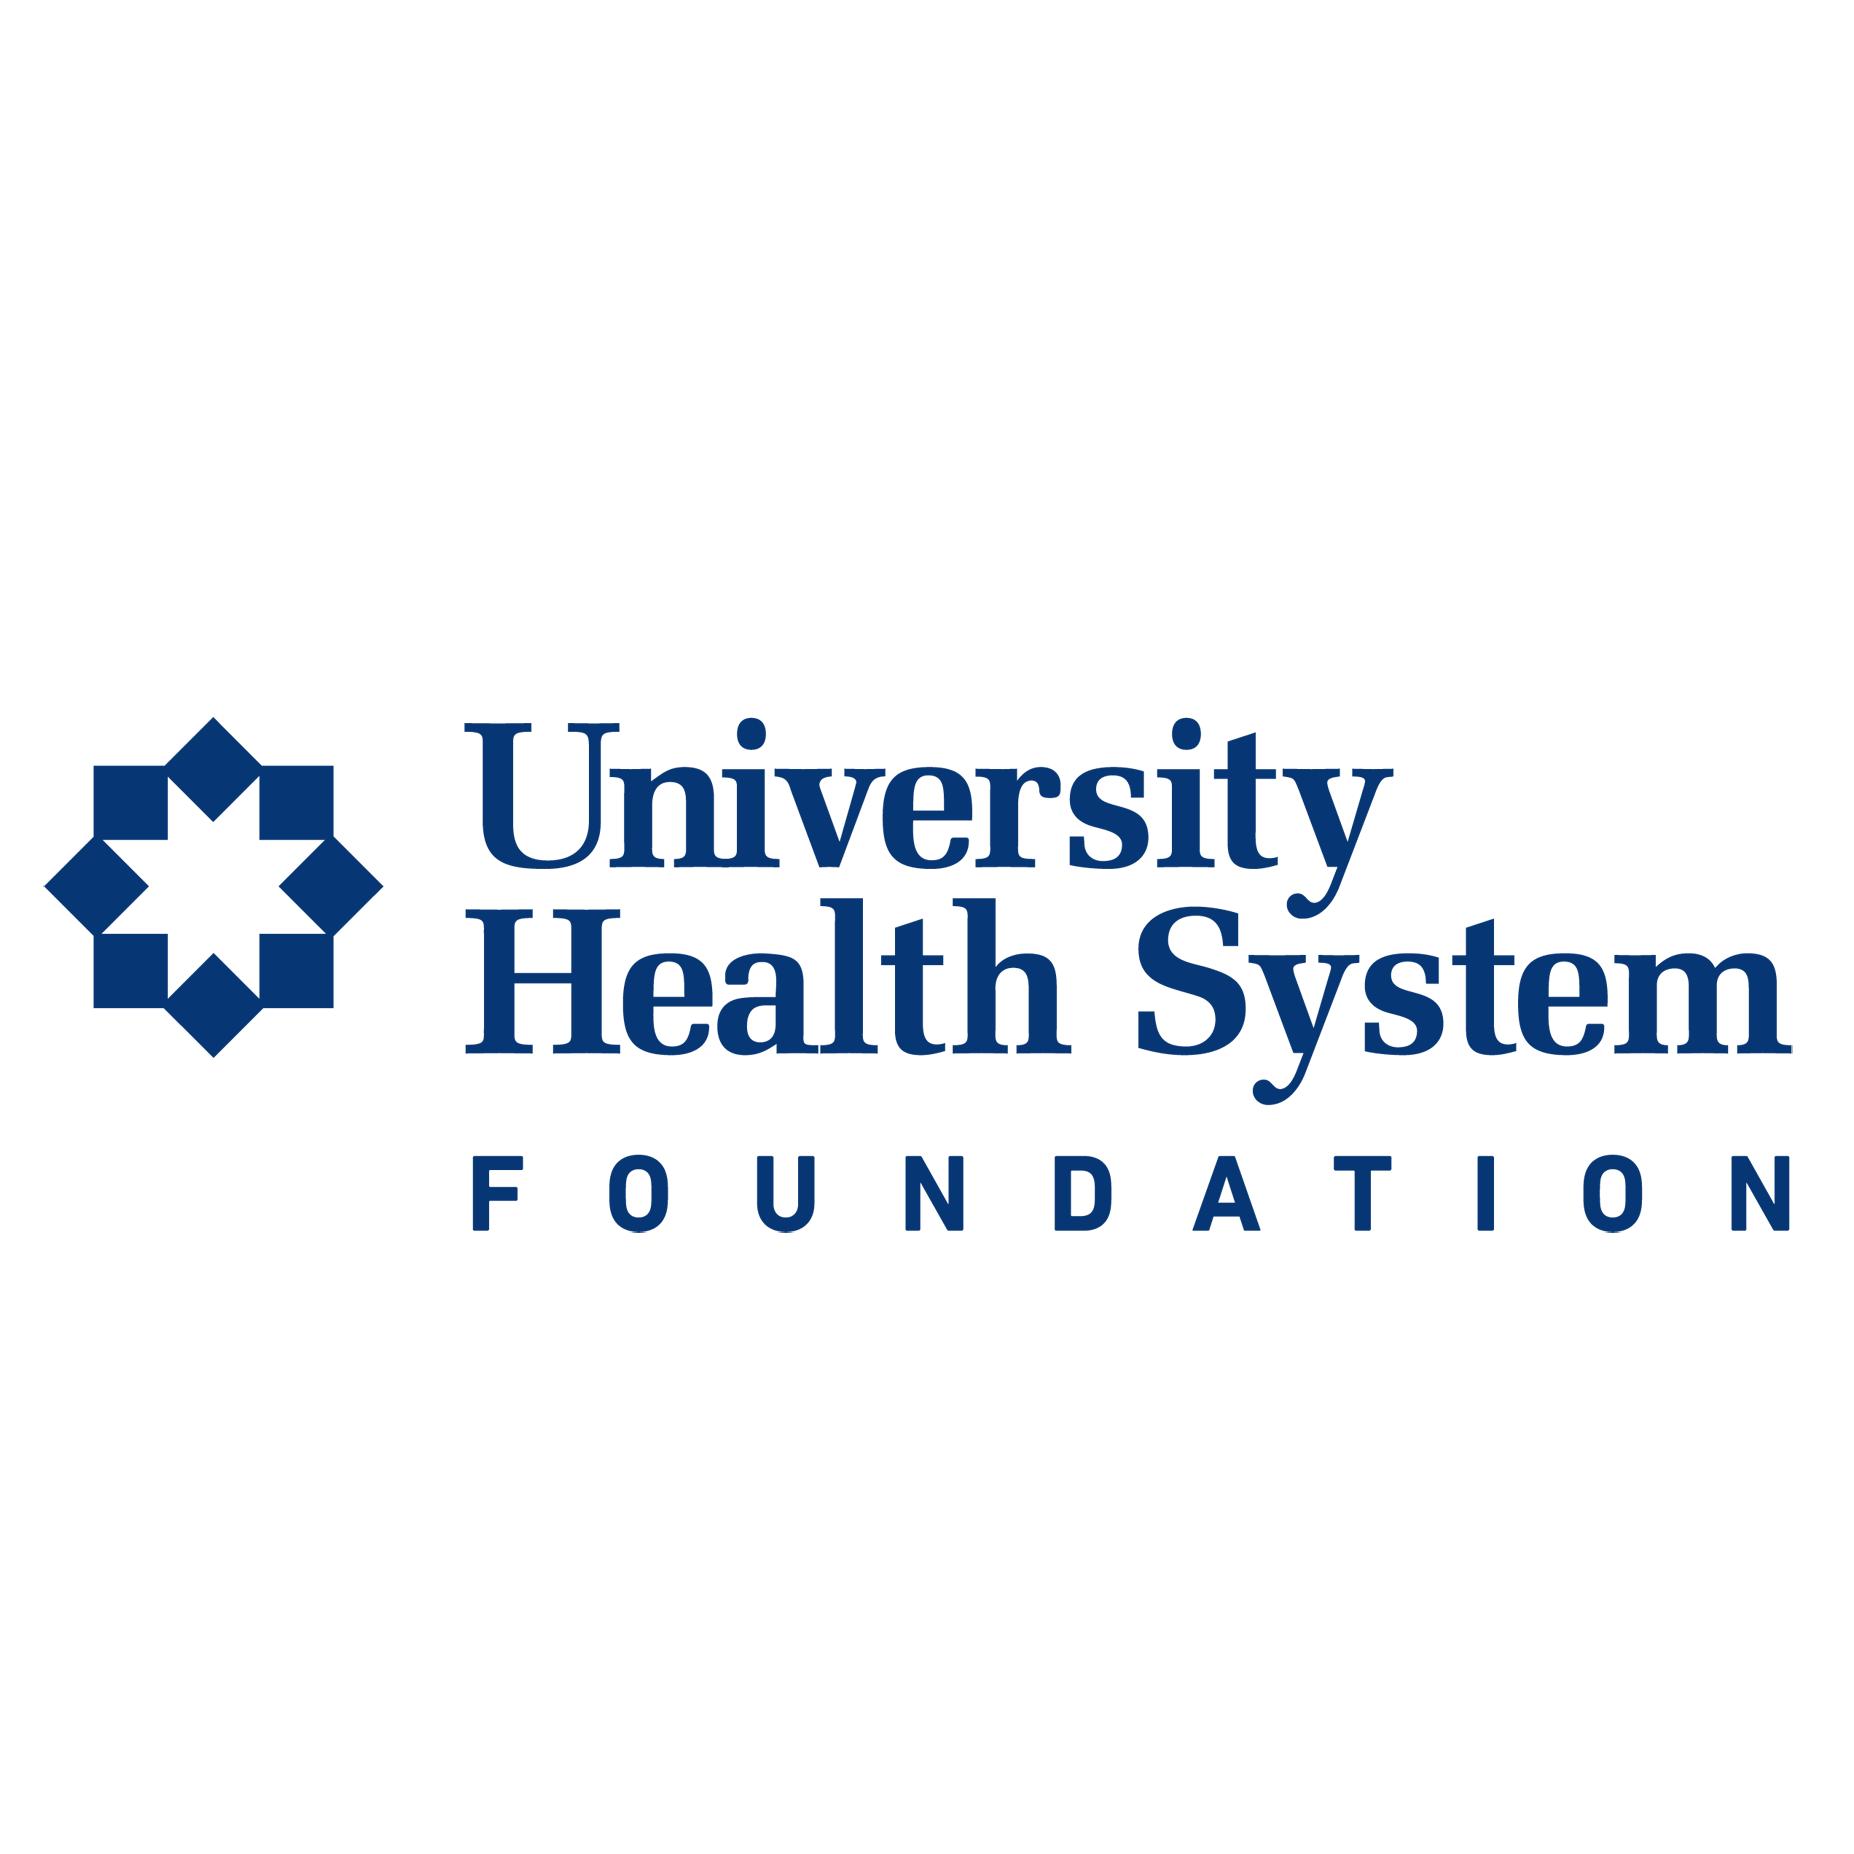 University Health System Foundation